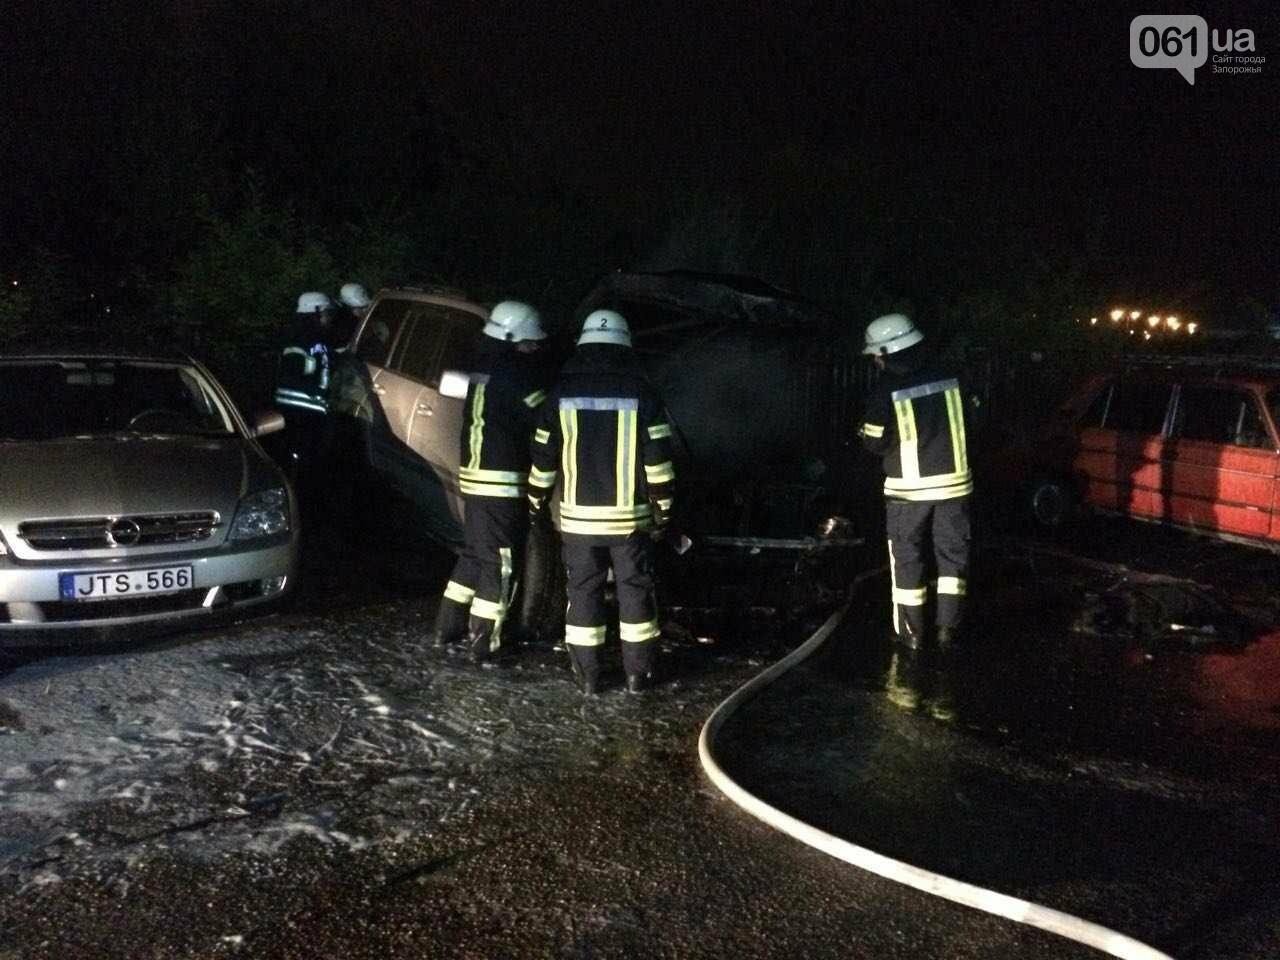 В центре Запорожья подрезали мужчину и сожгли его Тойоту, - ФОТО, фото-1